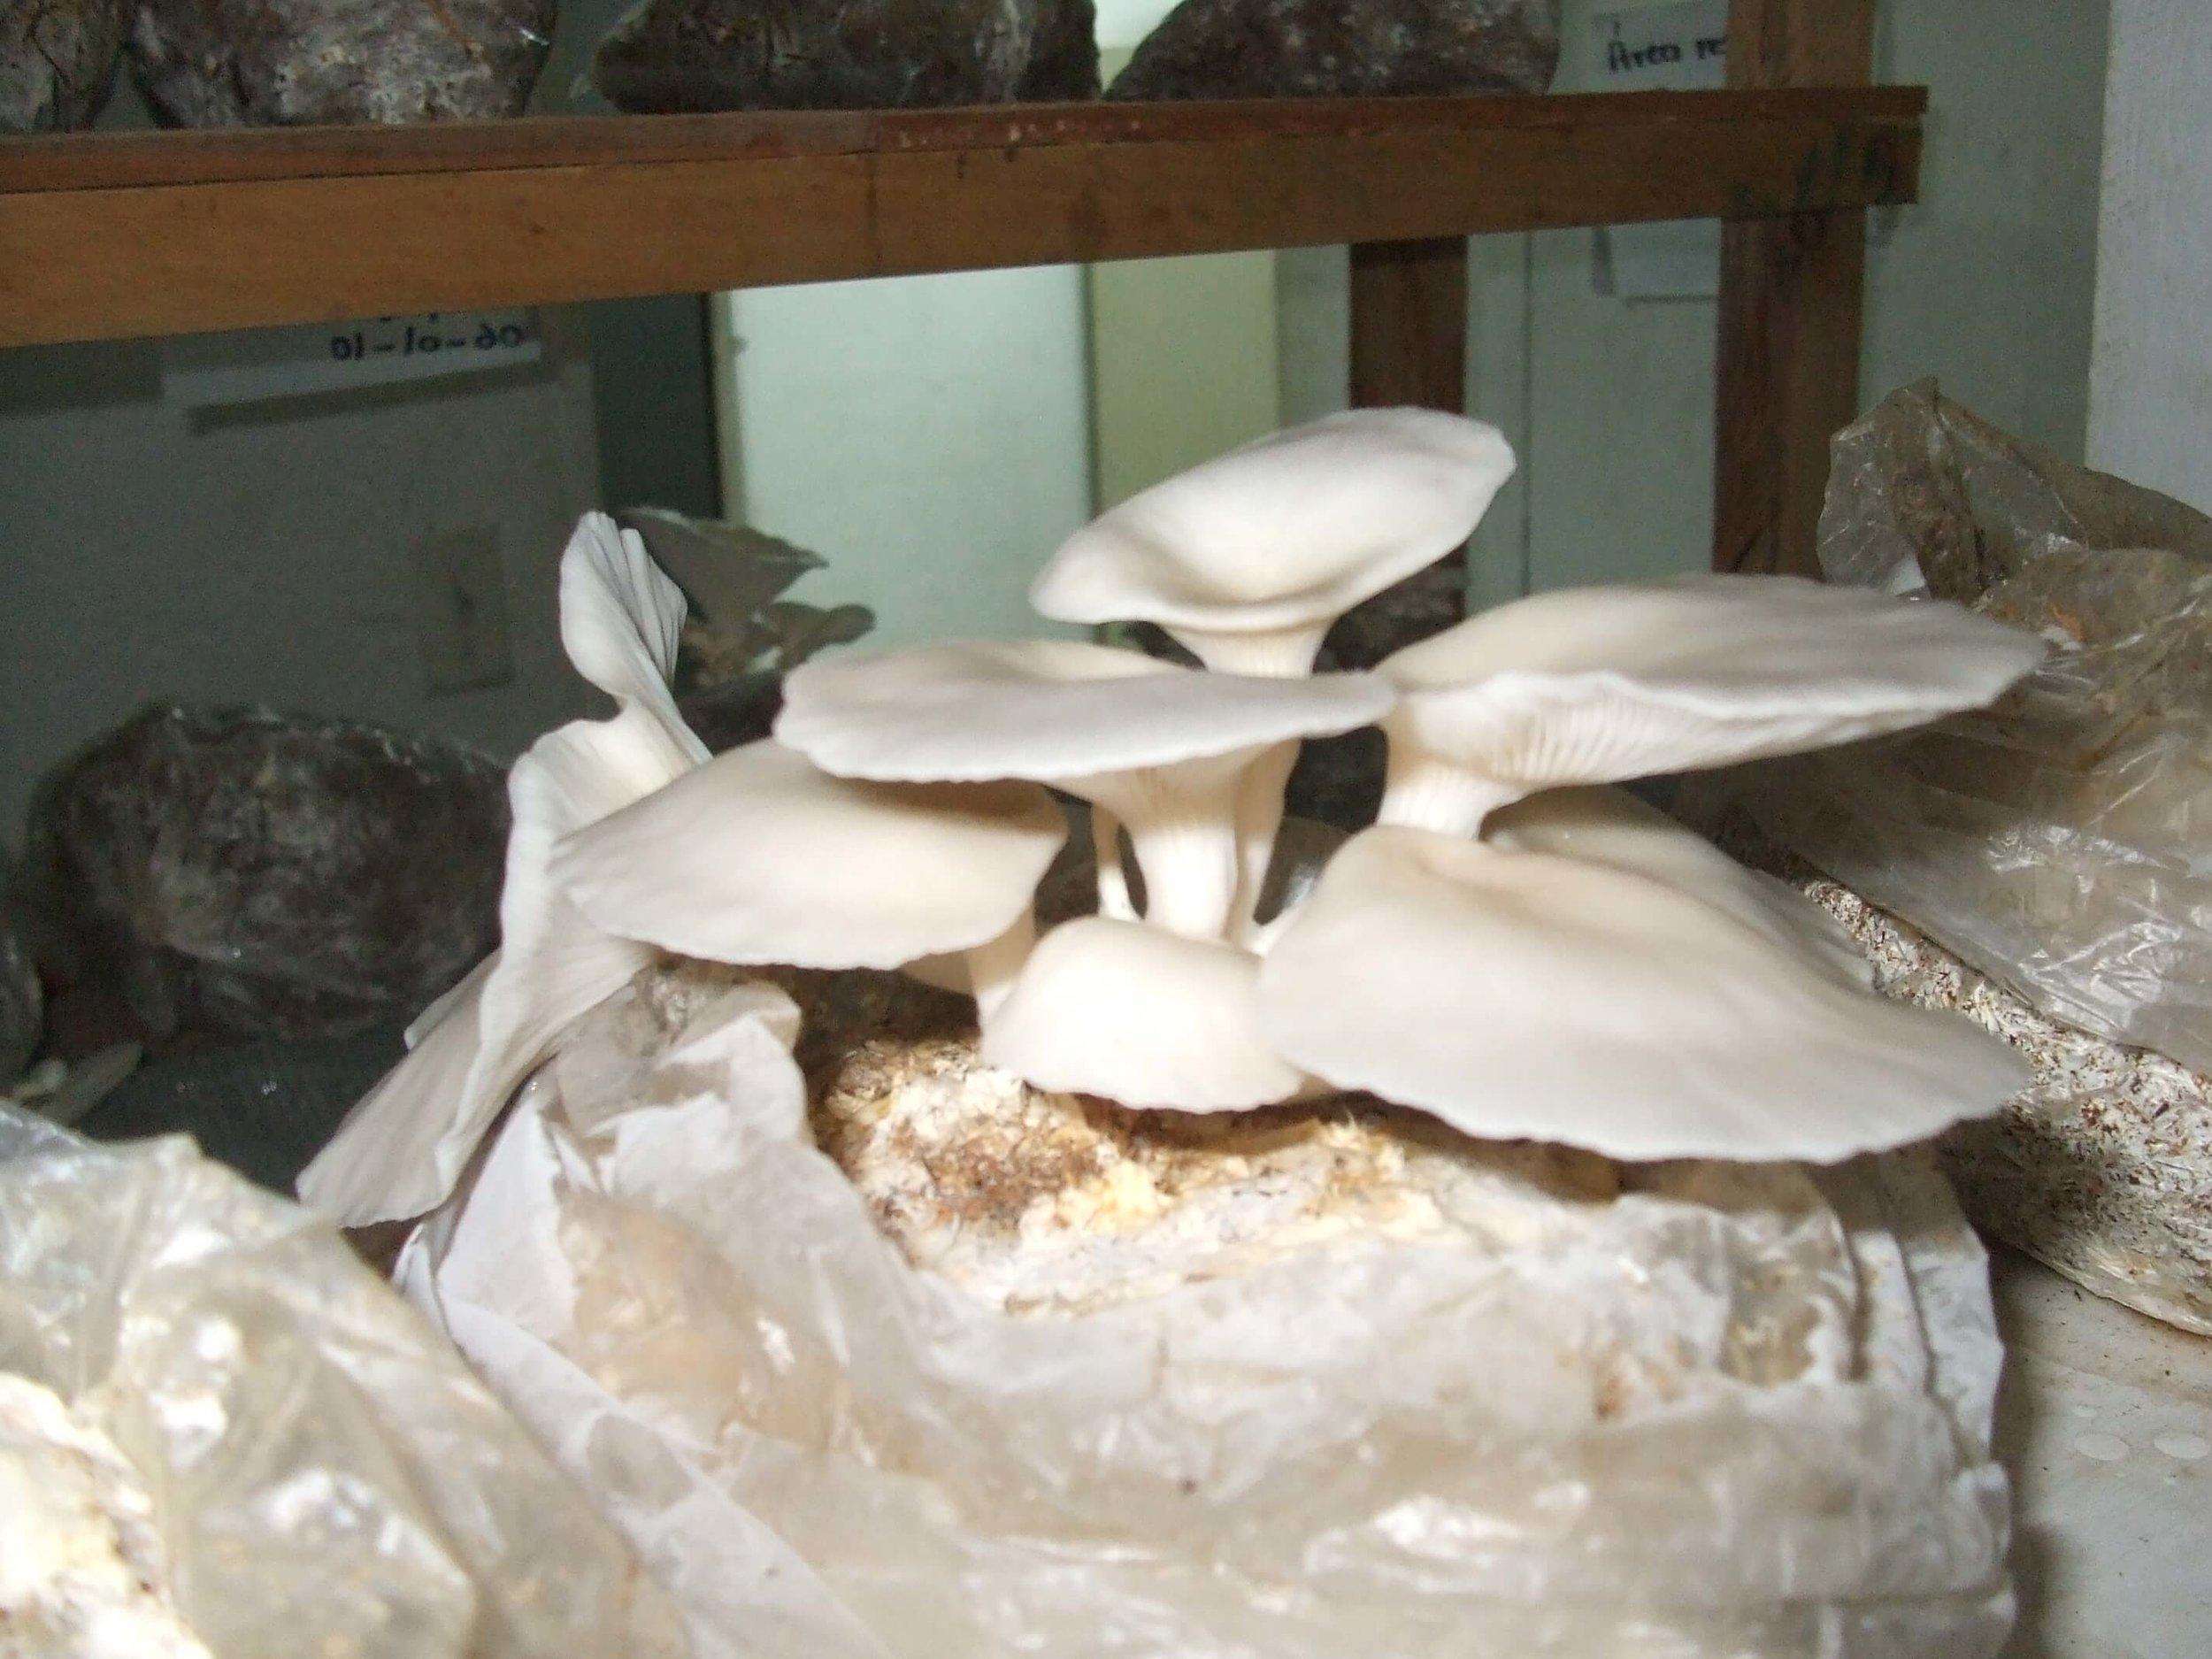 mushroom-production-3.jpg